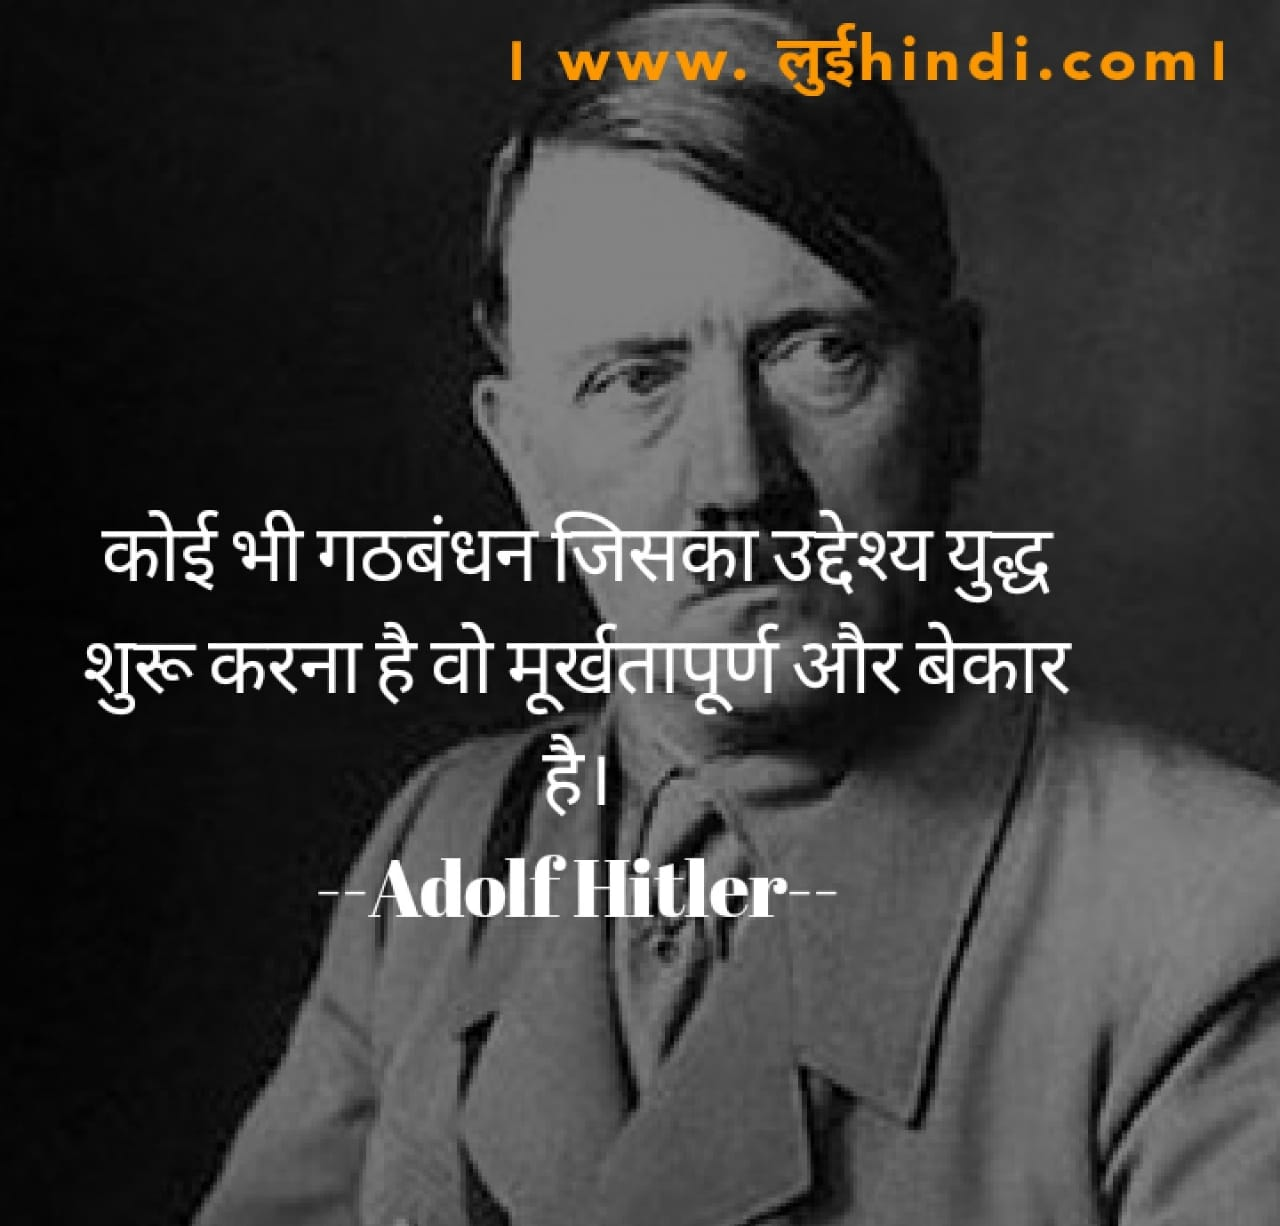 Adolf Hitler Quotes in Hindi - www.luiehindi.com